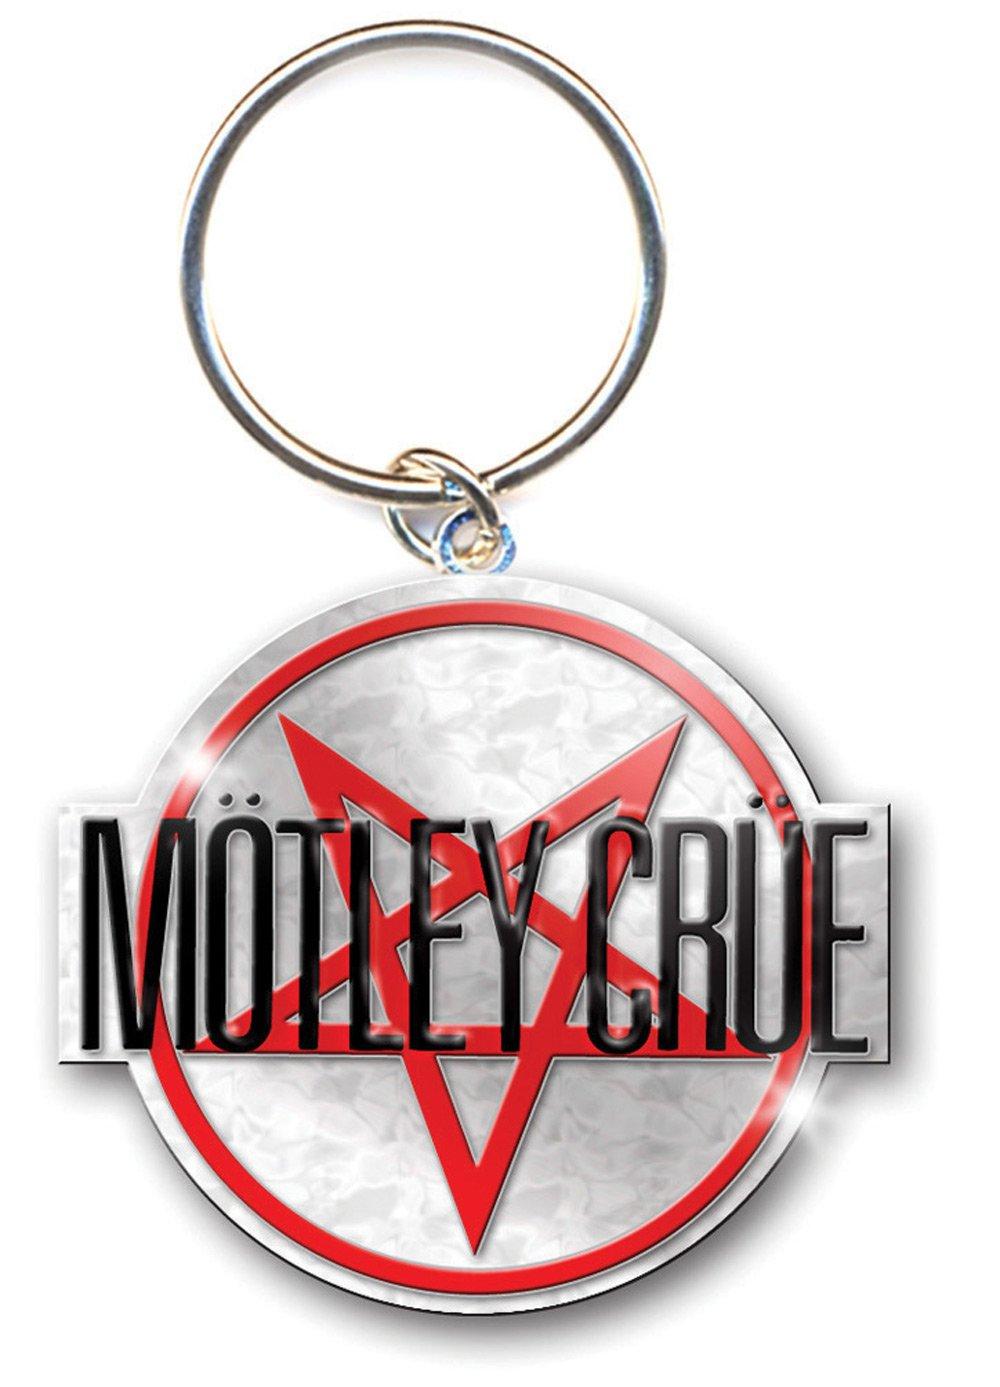 Motley Crue Shout At The Devil Pentagramma d/'argento metallo Portachiavi ufficia